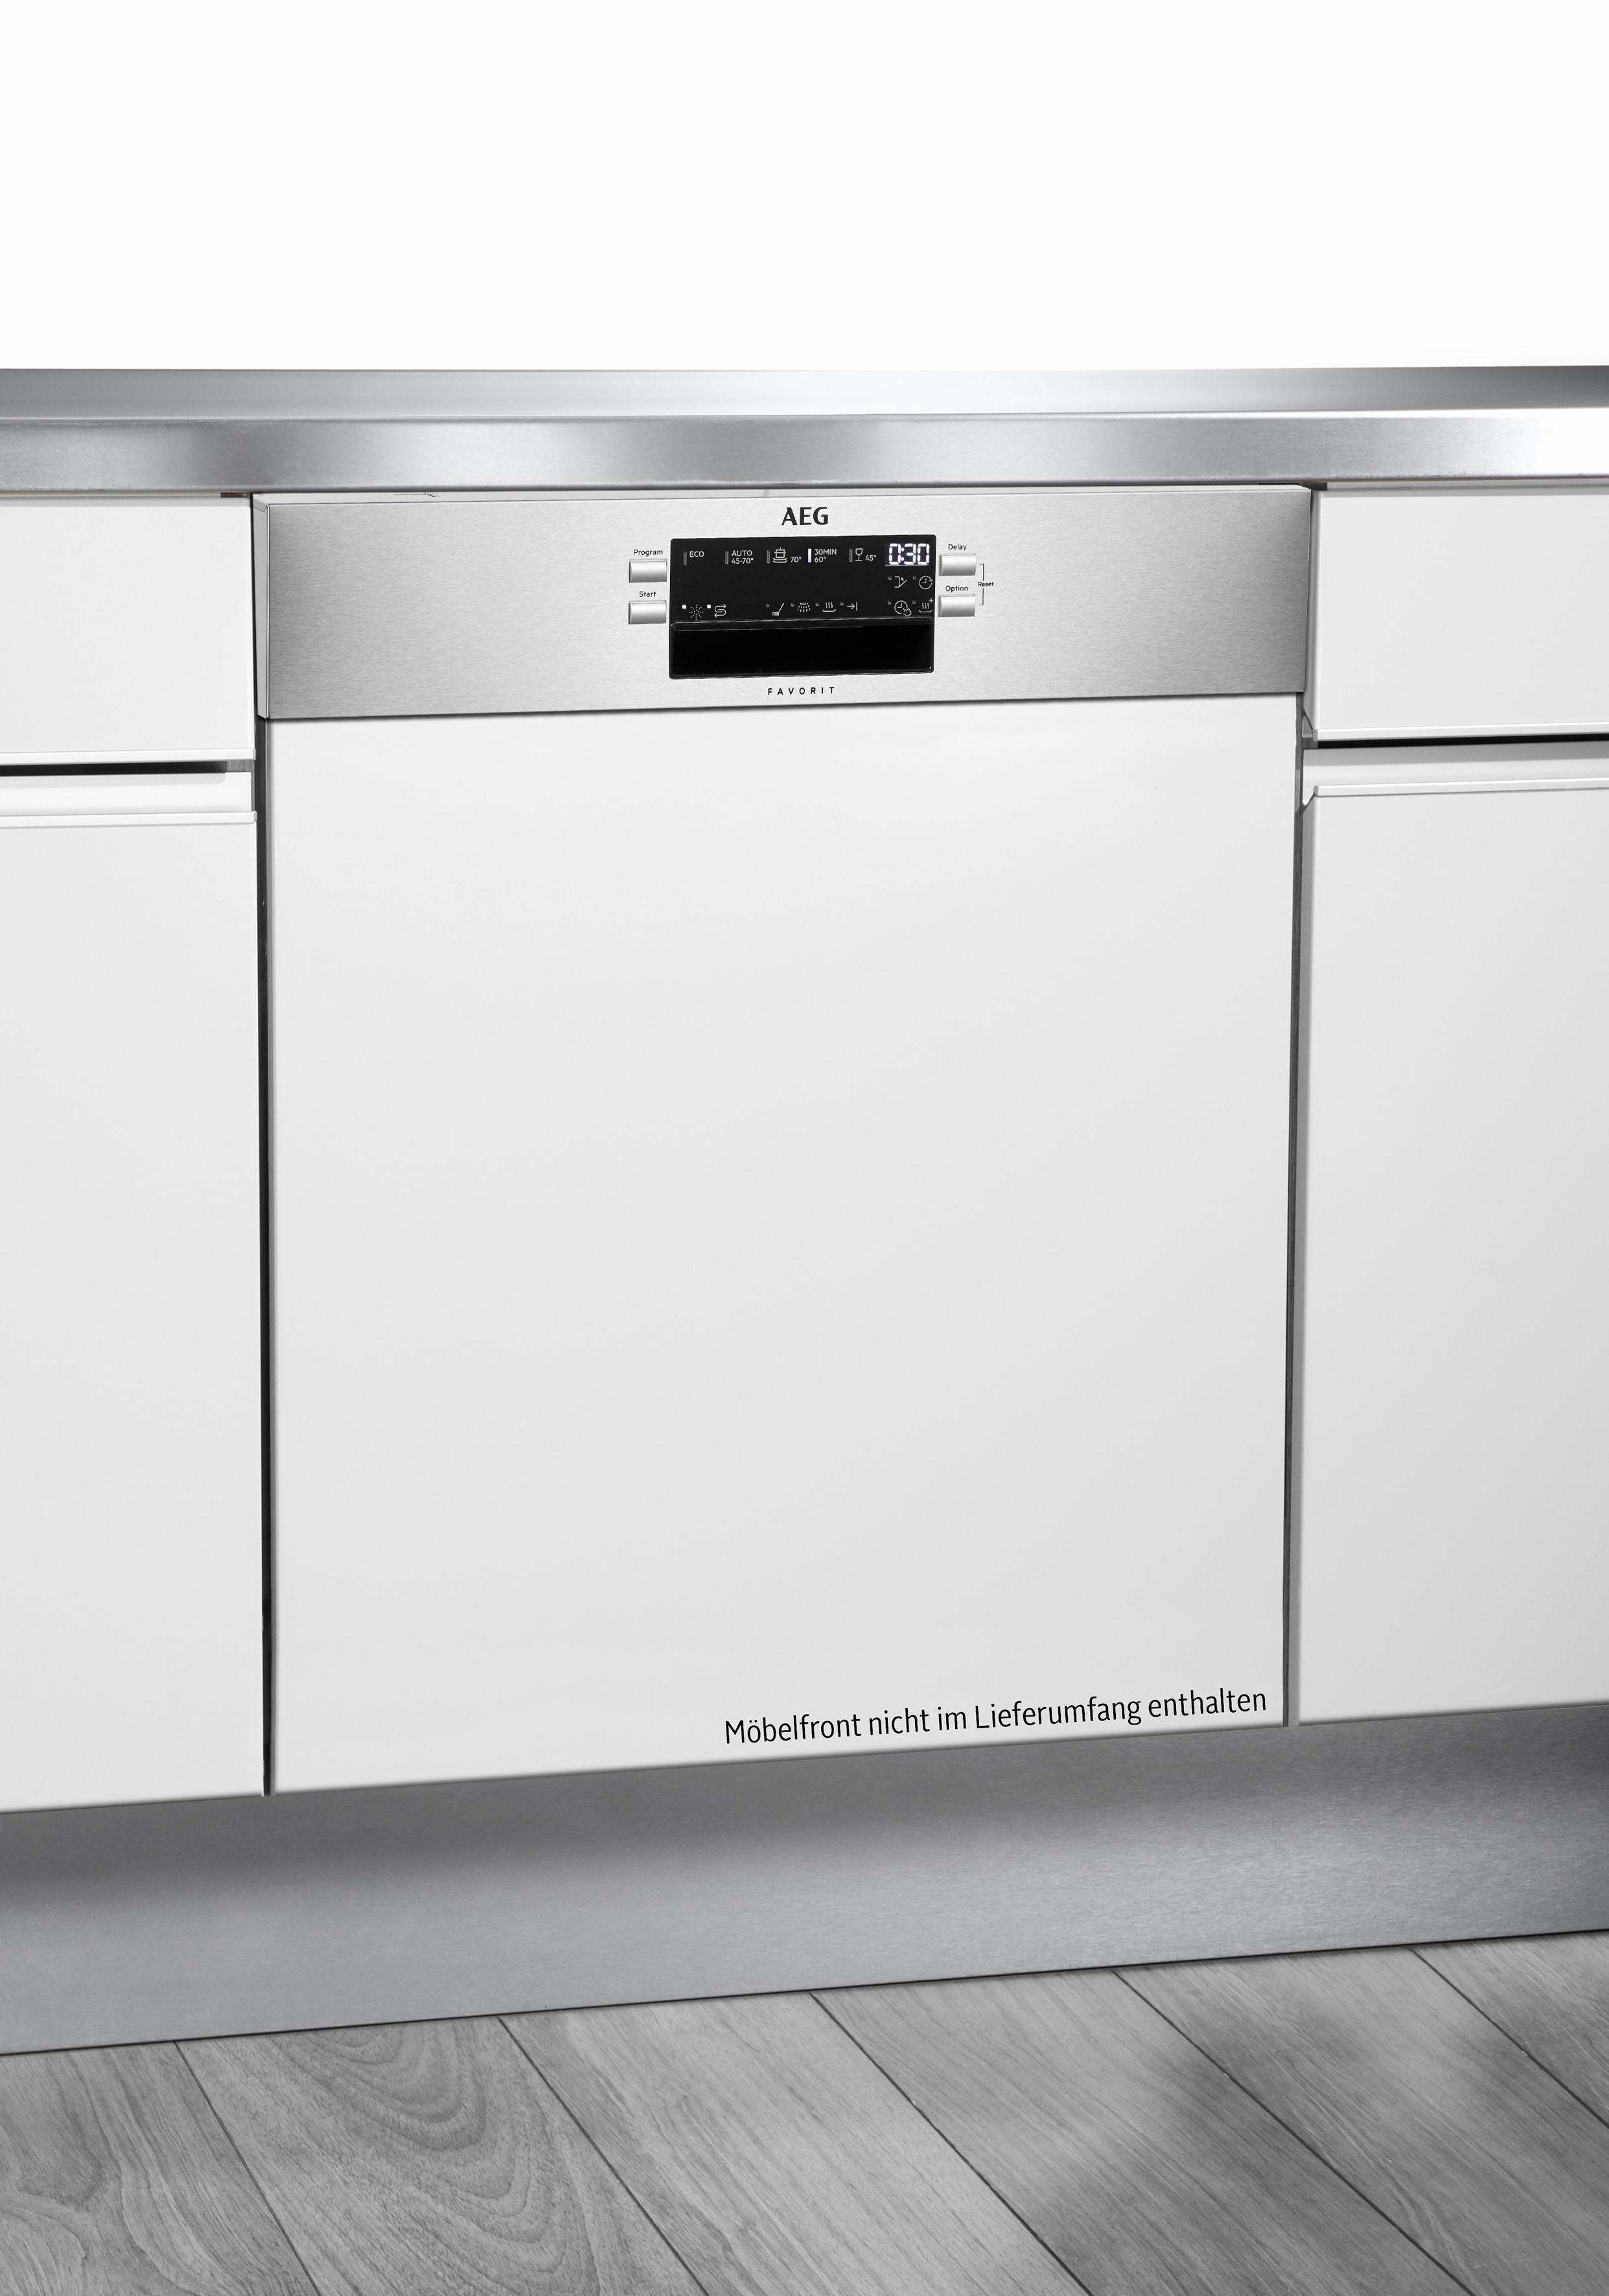 AEG teilintegrierbarer Geschirrspüler, FEB52610ZM, 9,9 l, 13 Maßgedecke, Energieeffizienzklasse A++